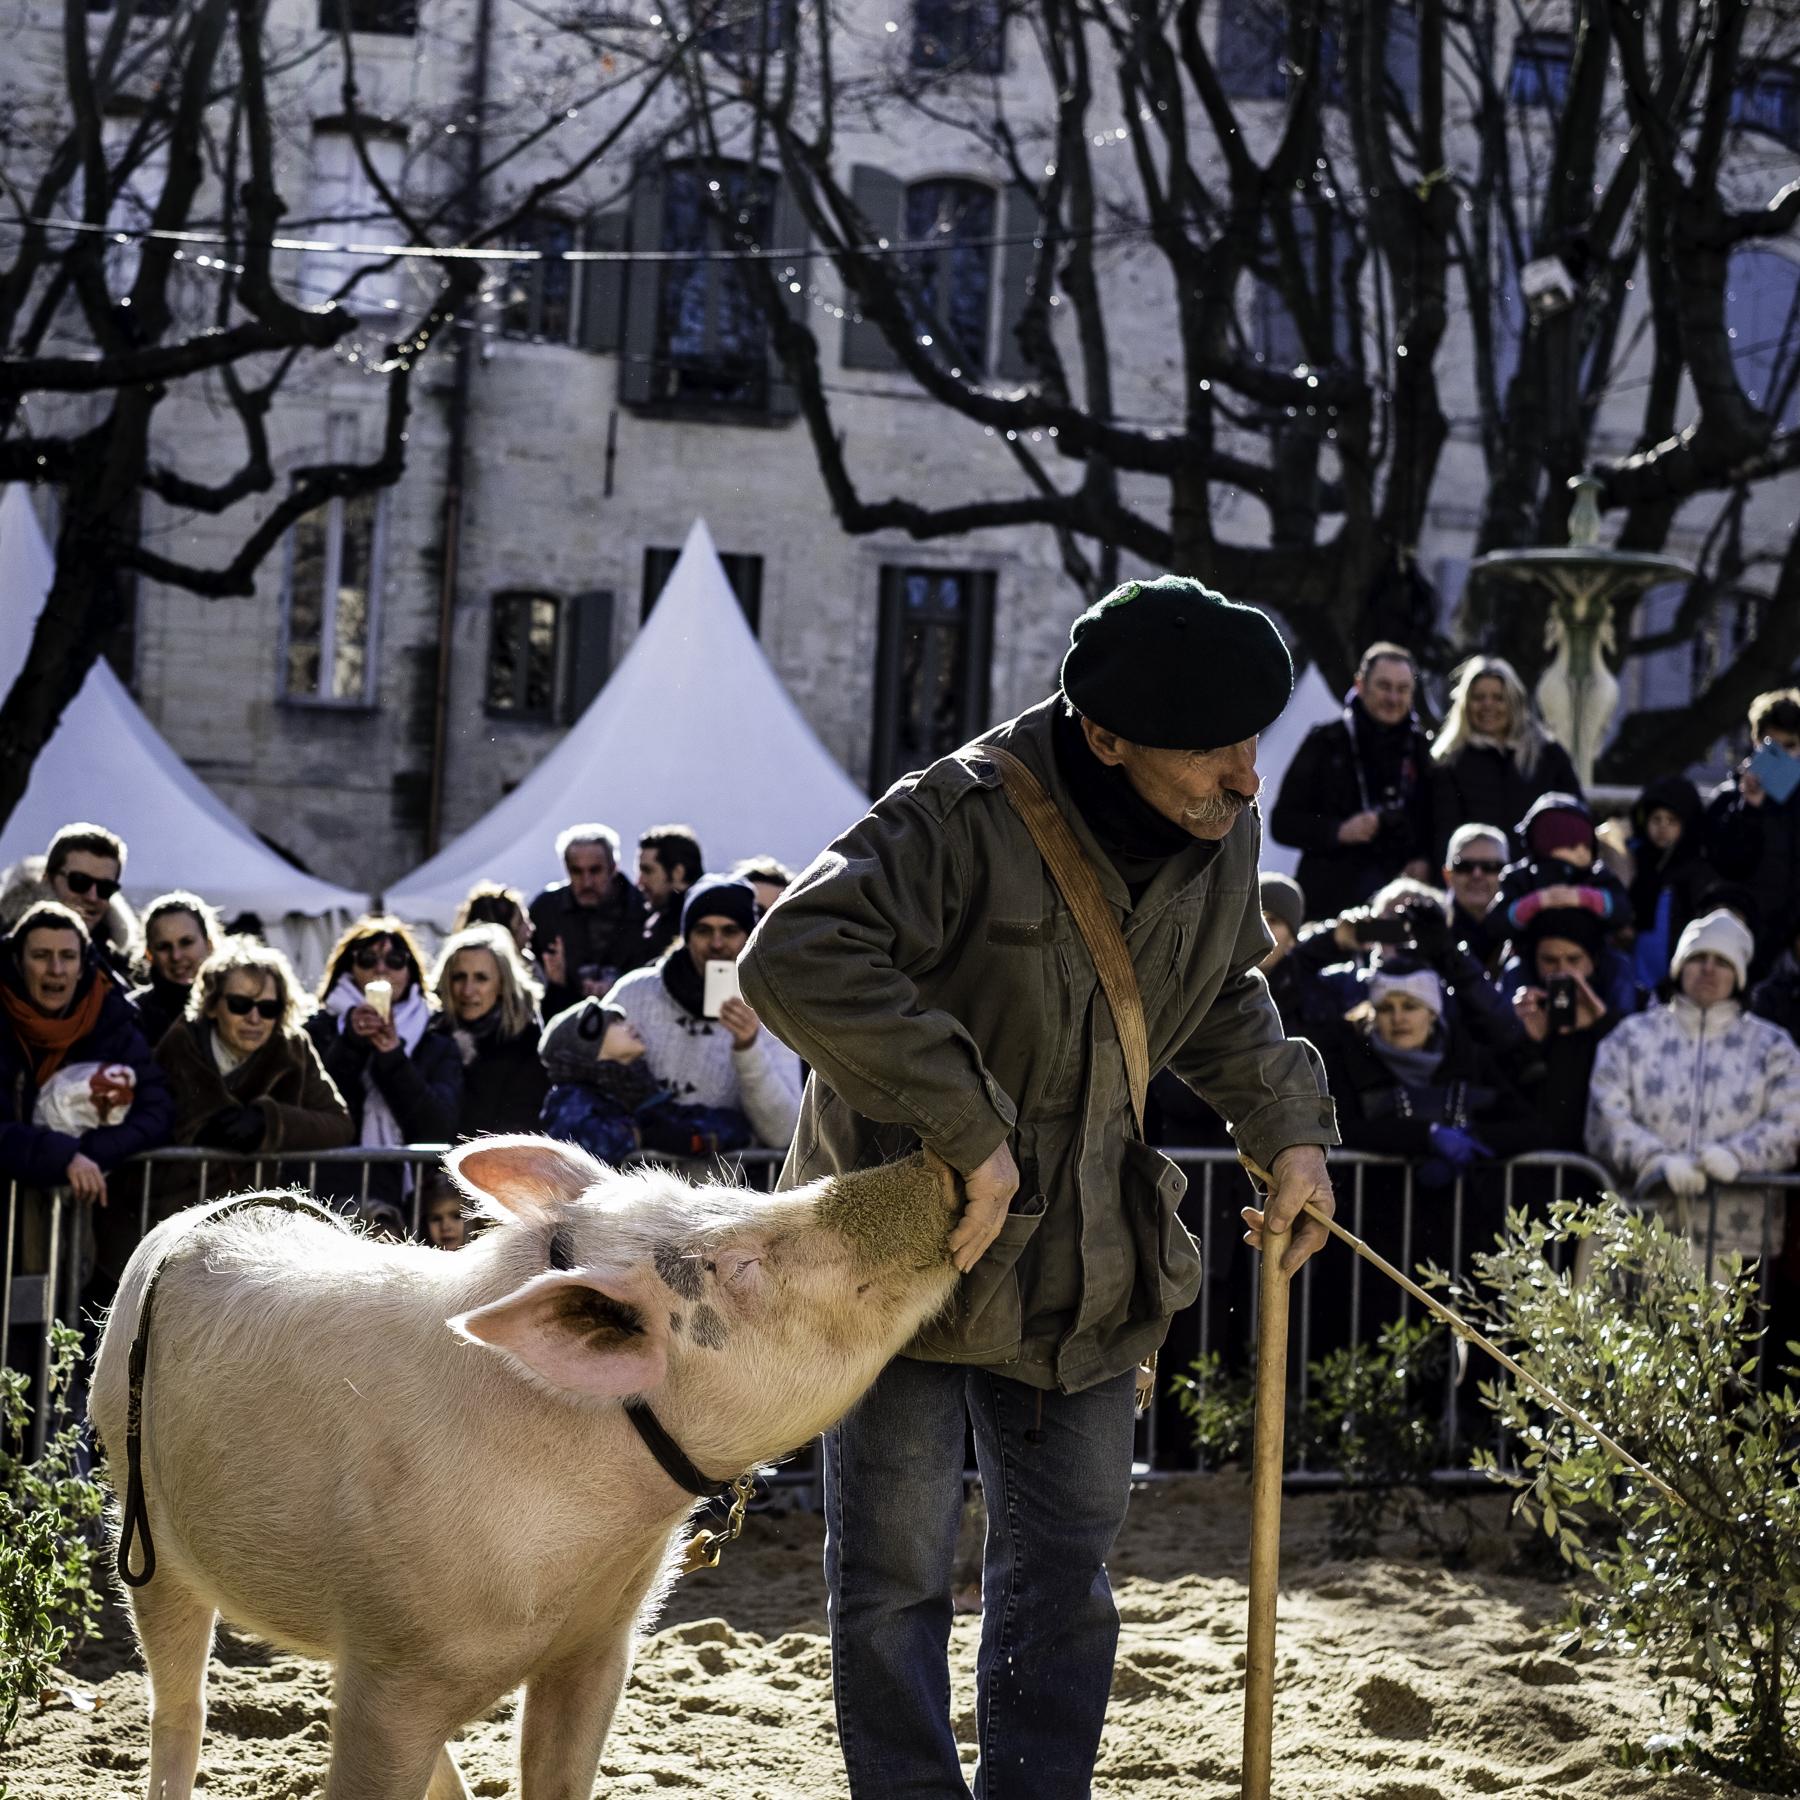 Truffle Hunter in Performance, Uzès